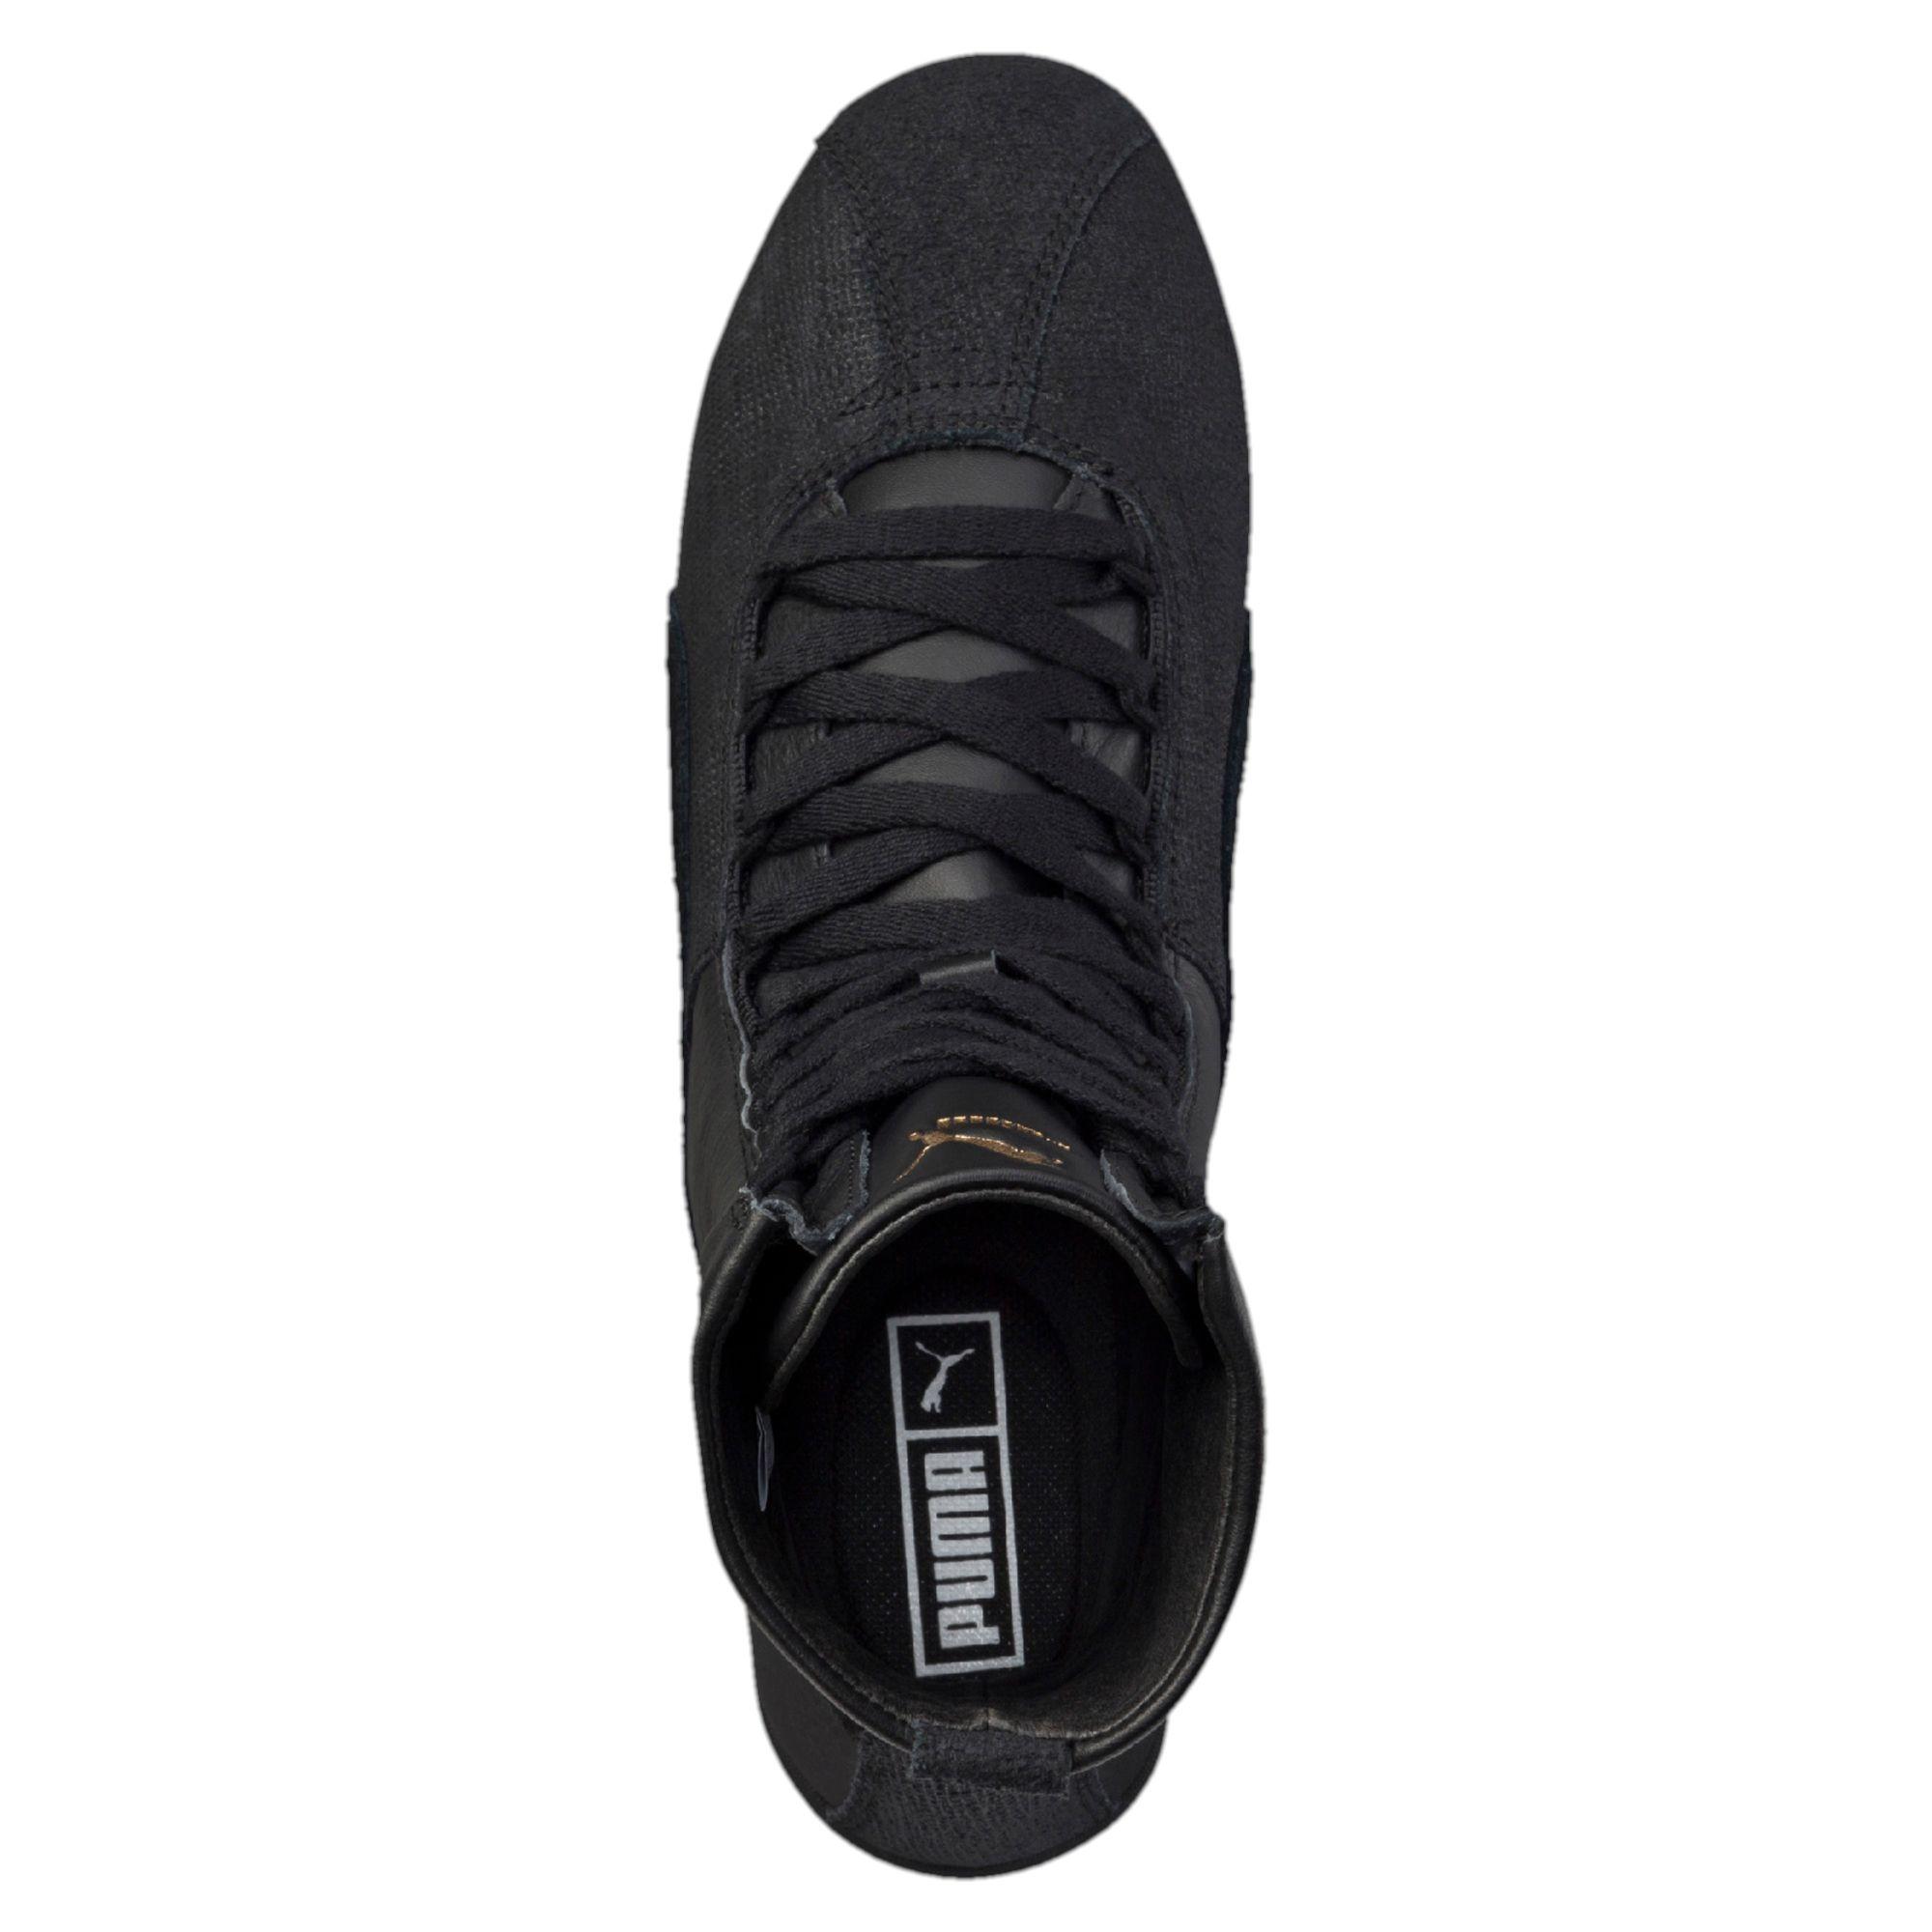 3ce4cb37b7a6 PUMA Eskiva Hi Remaster Damen Stiefel Sport Classics Hohe Stiefel ...